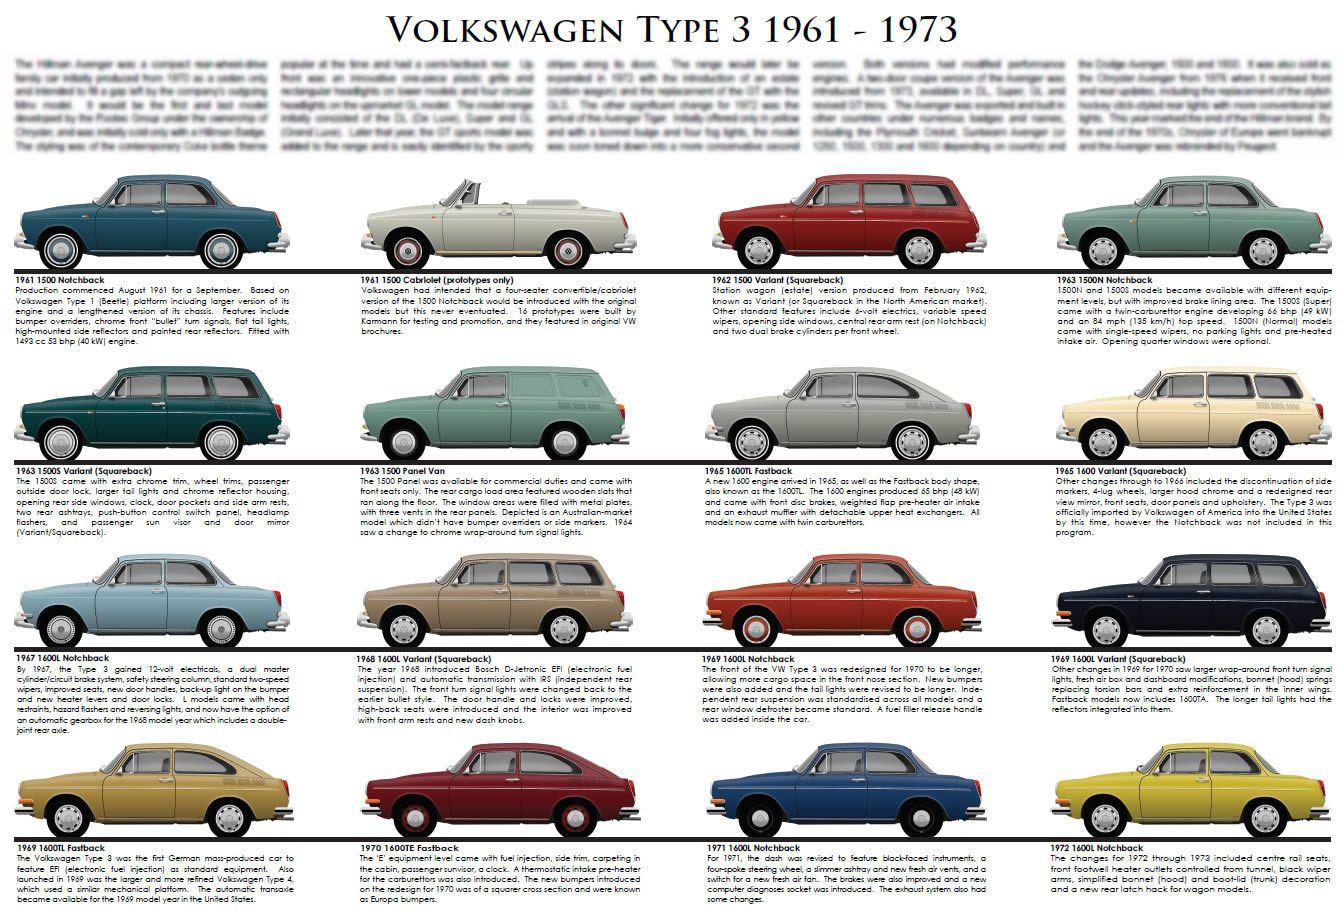 Volkswagen Type 3 Model Chart 1961 1973 Vw 1500 1600 Notchback Fastback Ebay